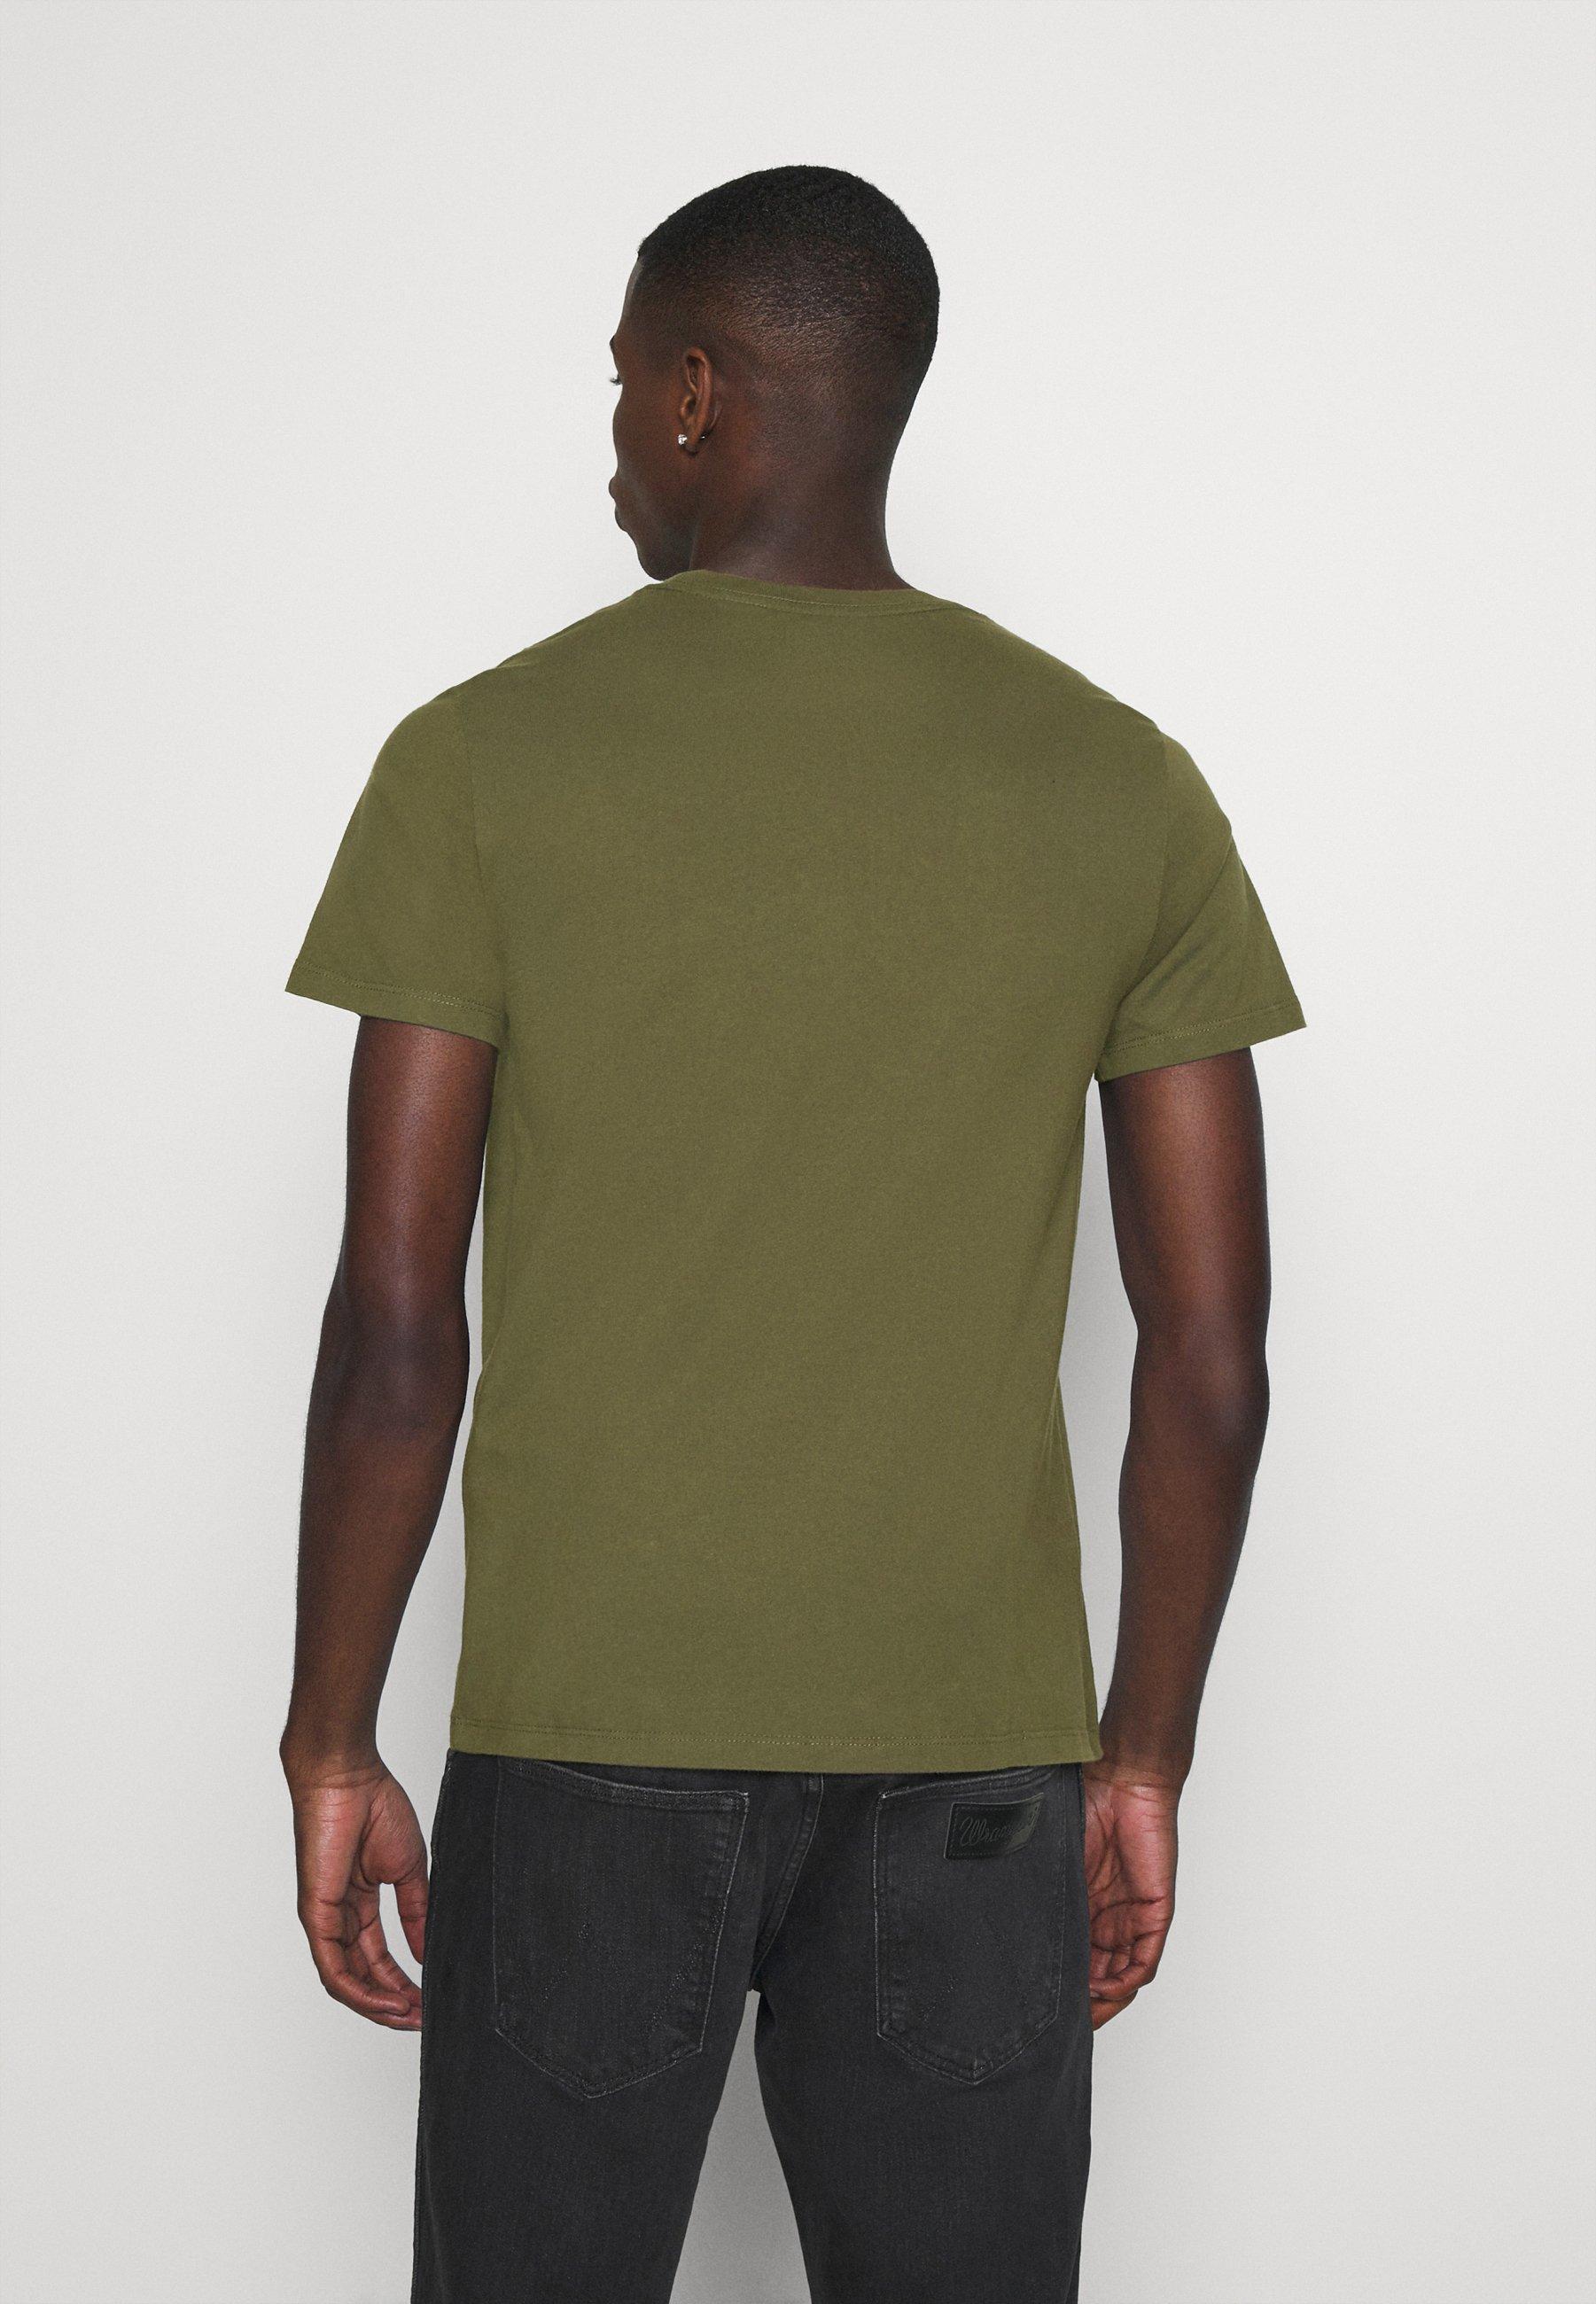 Levi's® Original Tee - T-shirts Olive Night/oliven